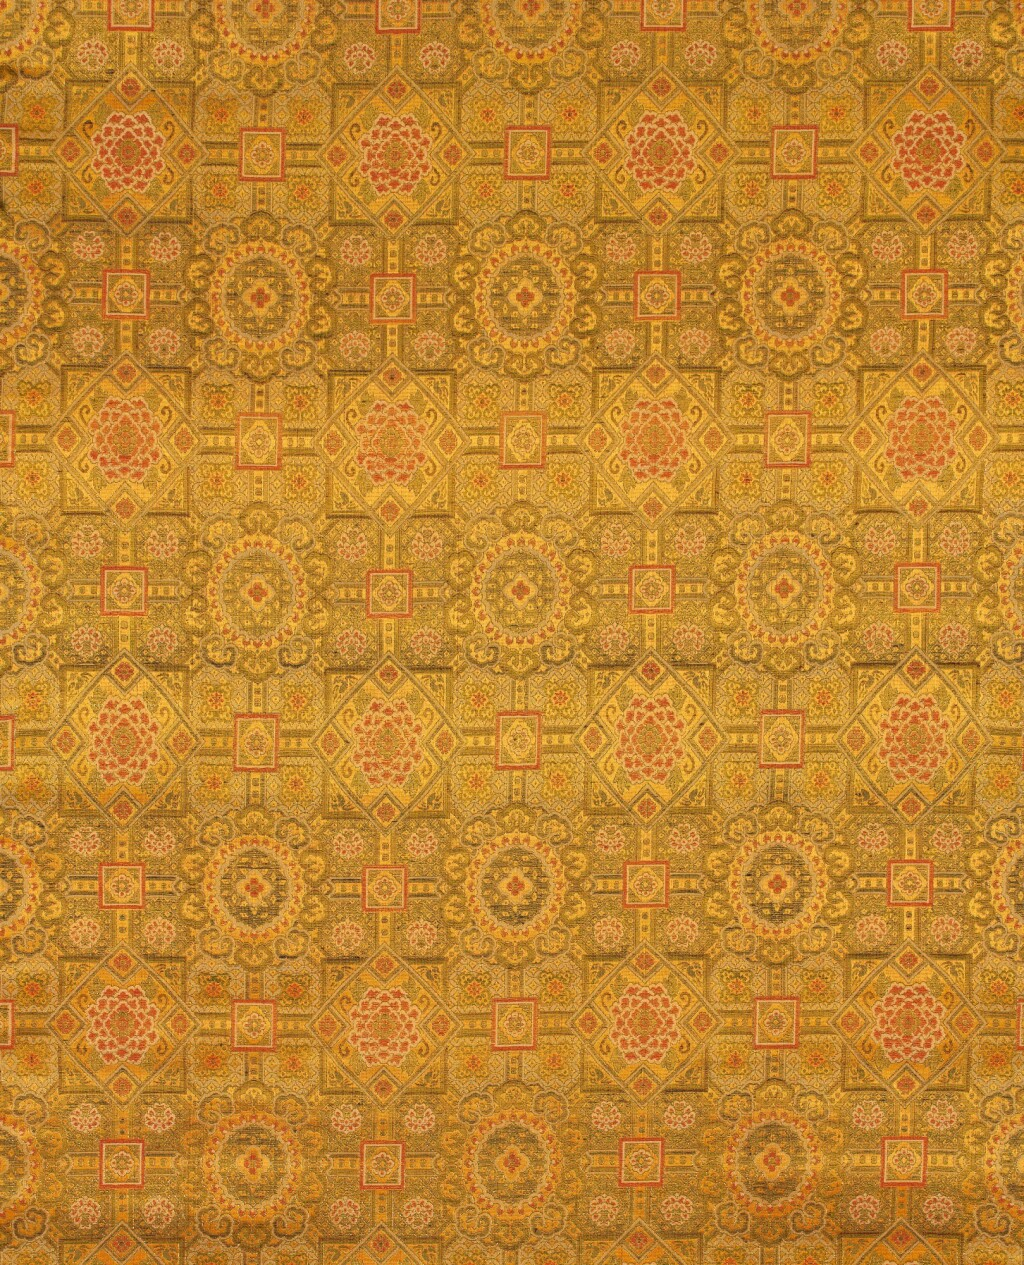 ROULEAU DE BROCARD DE SOIE ET FIL D'OR FIN DE LA DYNASTIE QING | 清晚期 黃地如意花卉紋織金錦一匹 | A bolt of silk brocade and gold thread, late Qing Dynasty